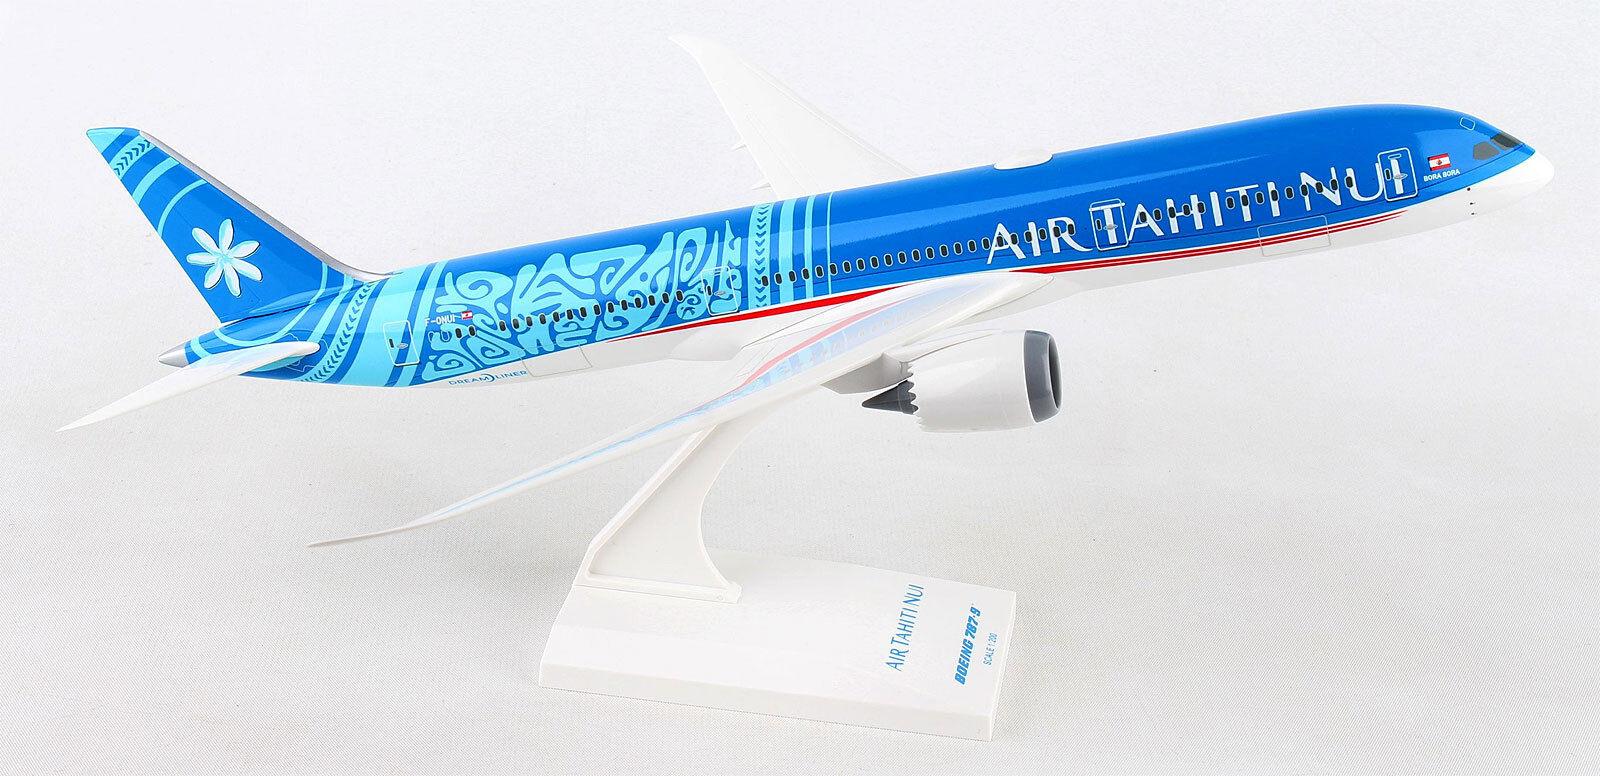 Air Tahiti Nui-Boeing 787-9 - 1 200 - Skymarks modèle skr976-b787 Dreamliner